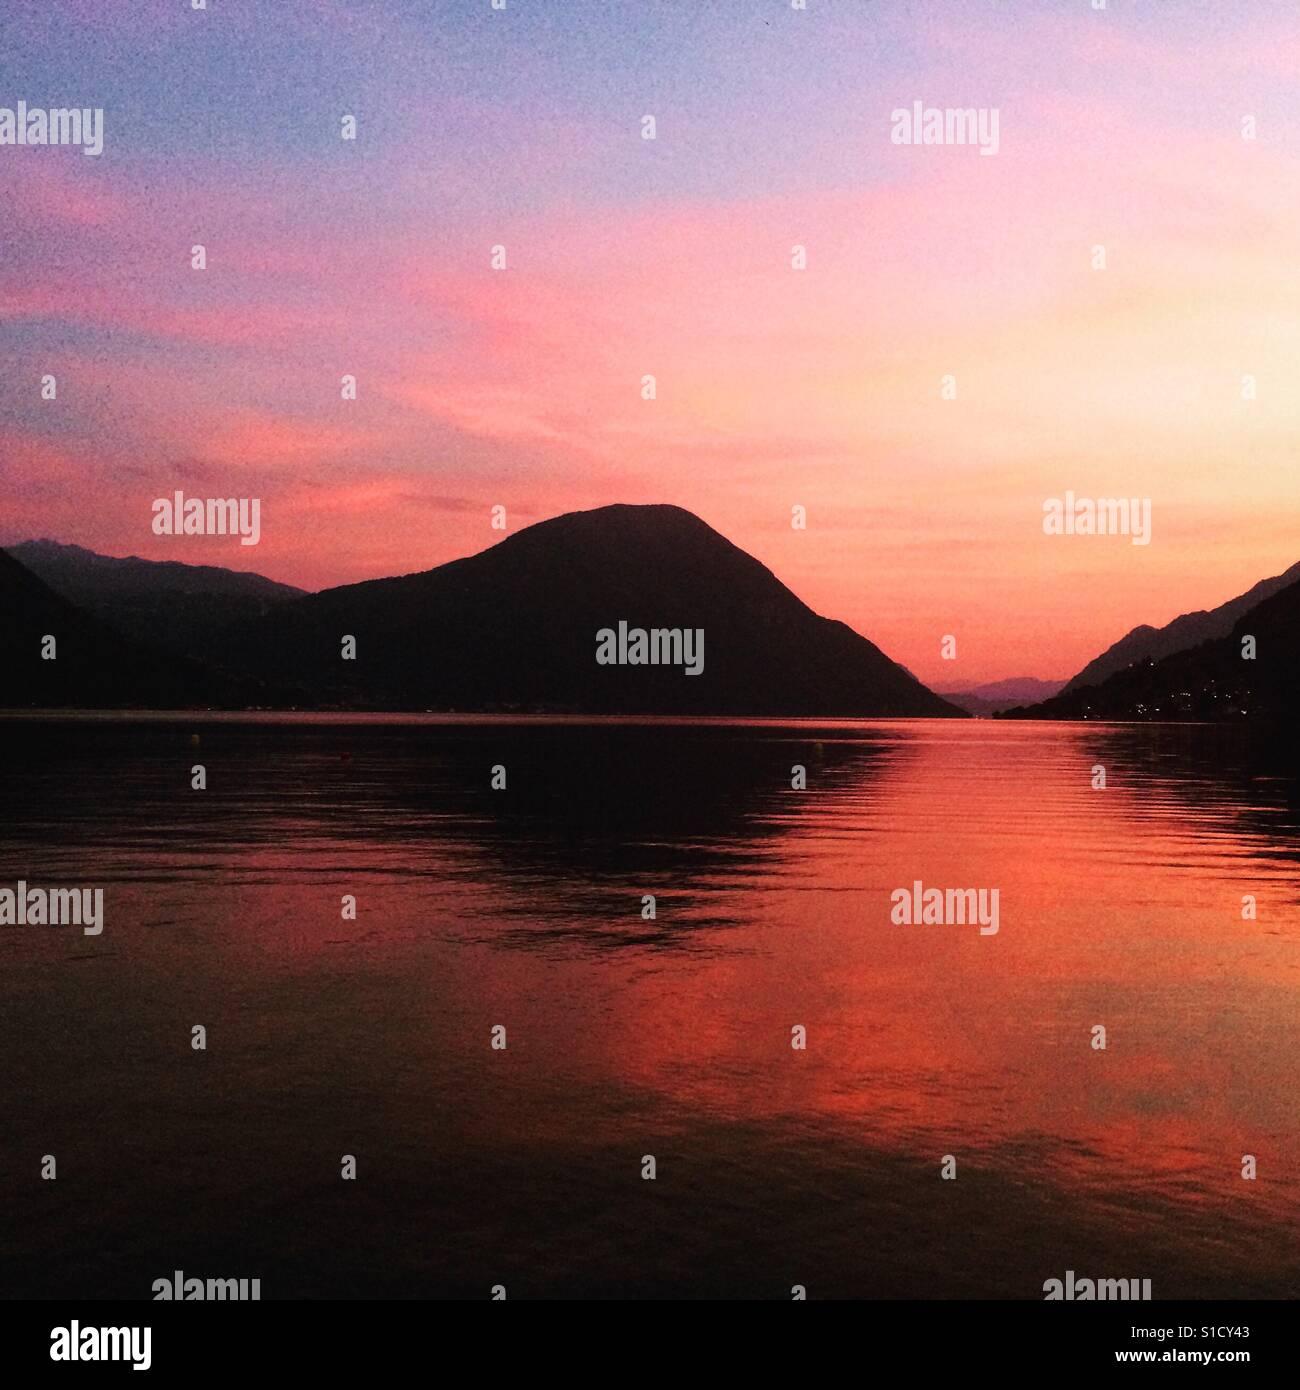 Sunset on the Lake - Stock Image